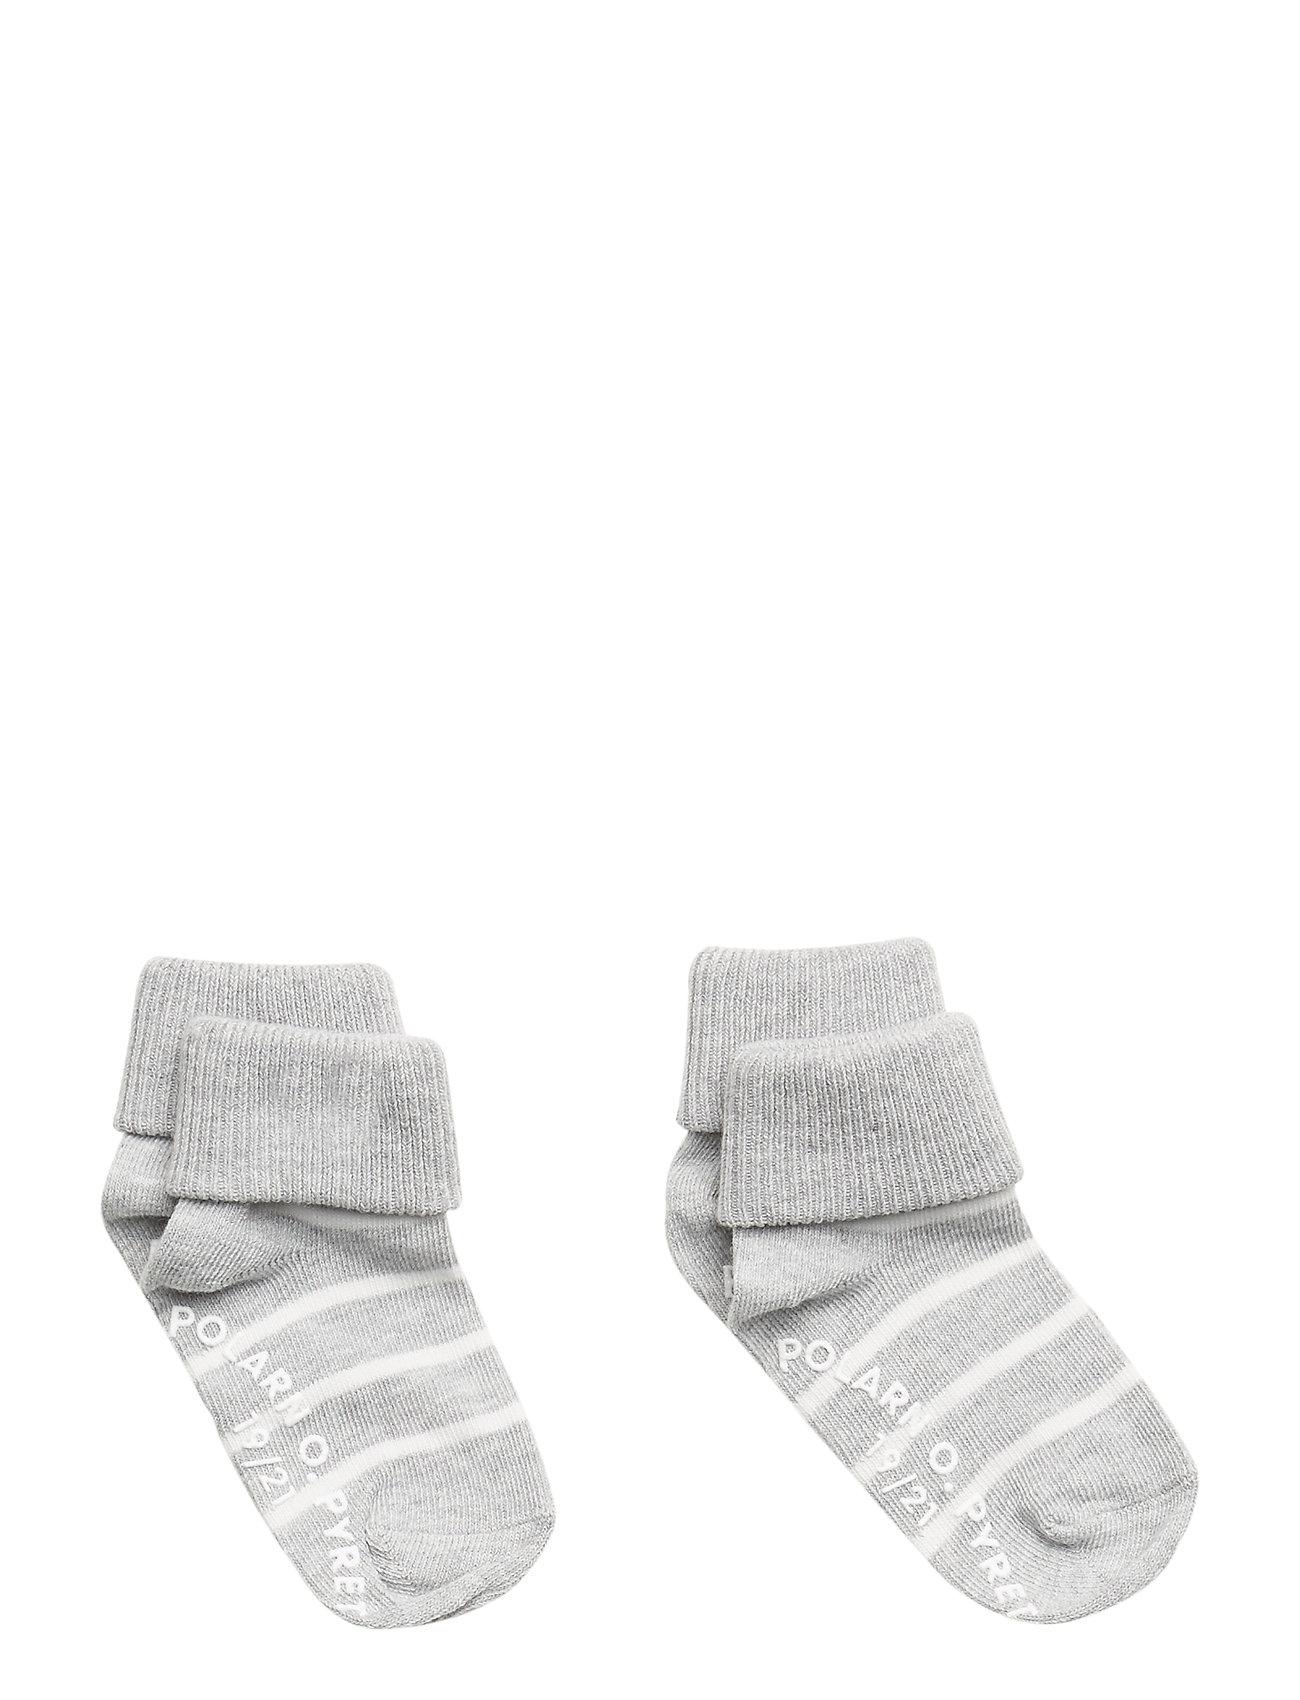 Polarn O. Pyret Socks 2-P Turn-up Anti Slip PO.P Stripe - GREYMELANGE